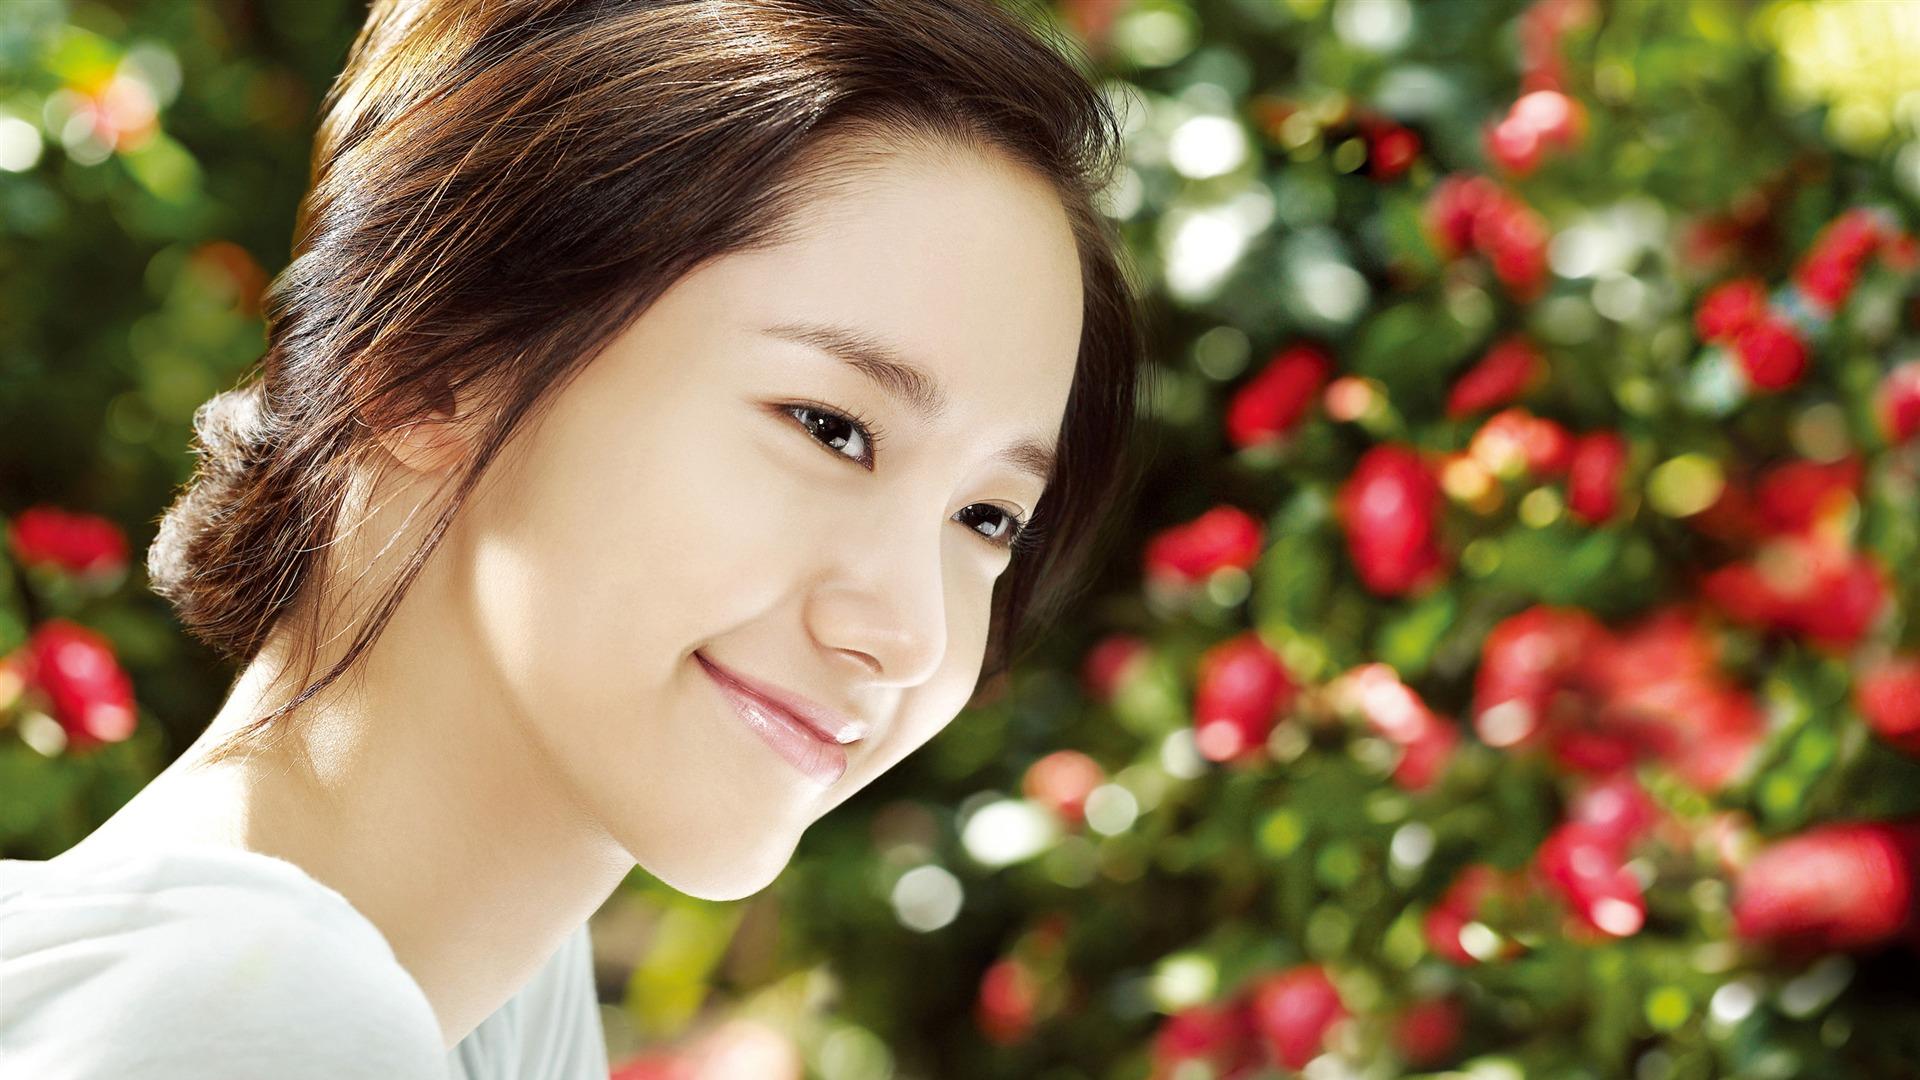 Yoona Korean Girls Generation HD Photo Wallpaper 08 Preview